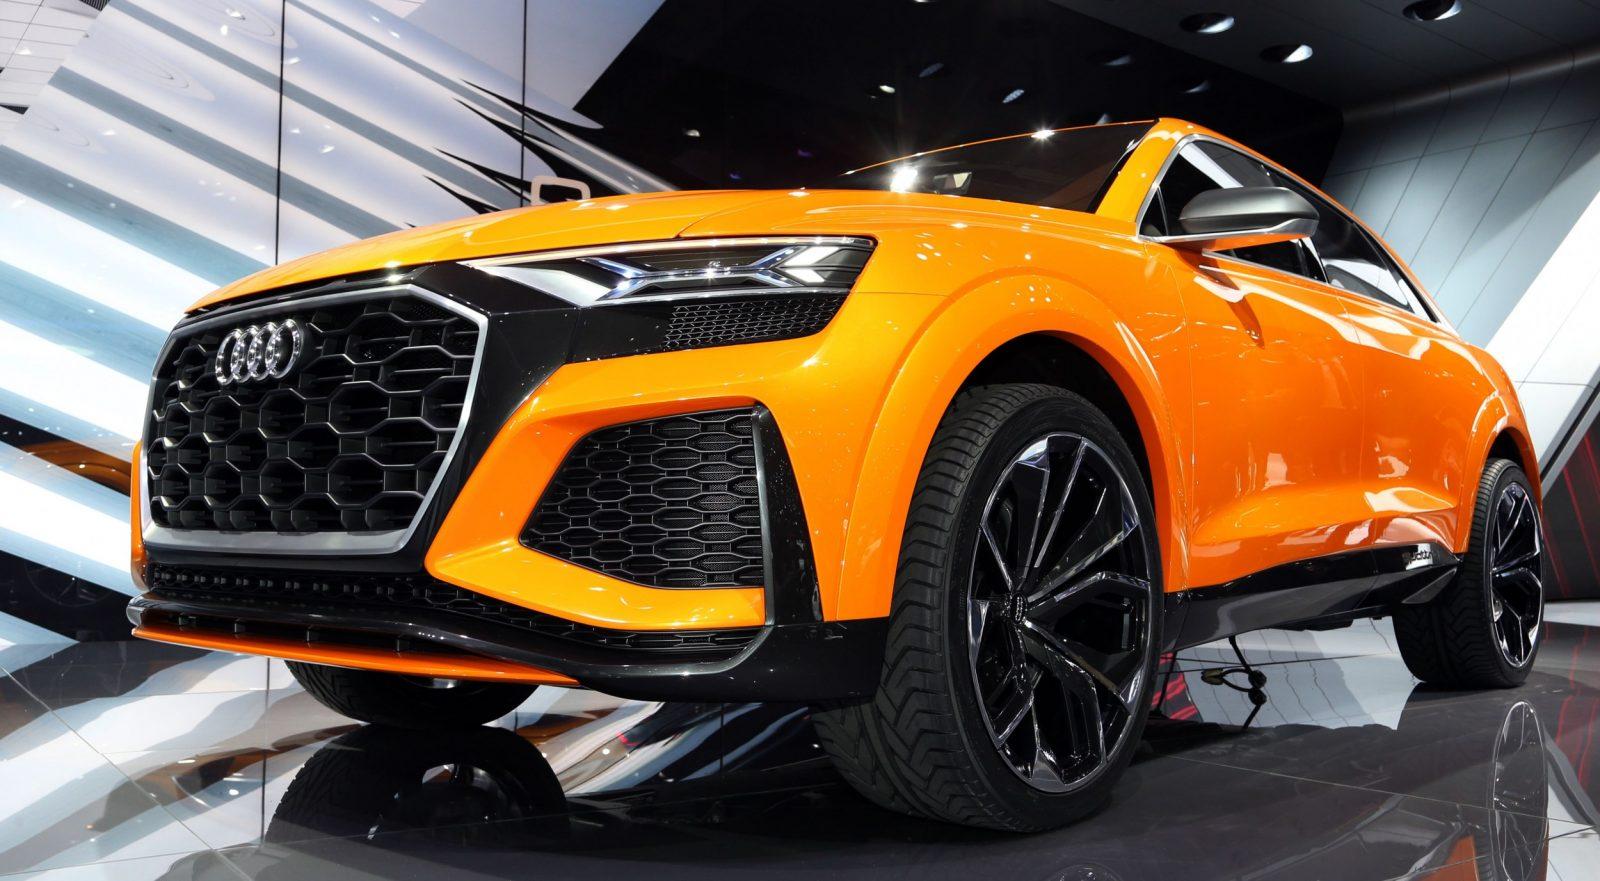 Audi Q8 Confirmed for 2019 Modelyear [22 New Photos] » CAR ...